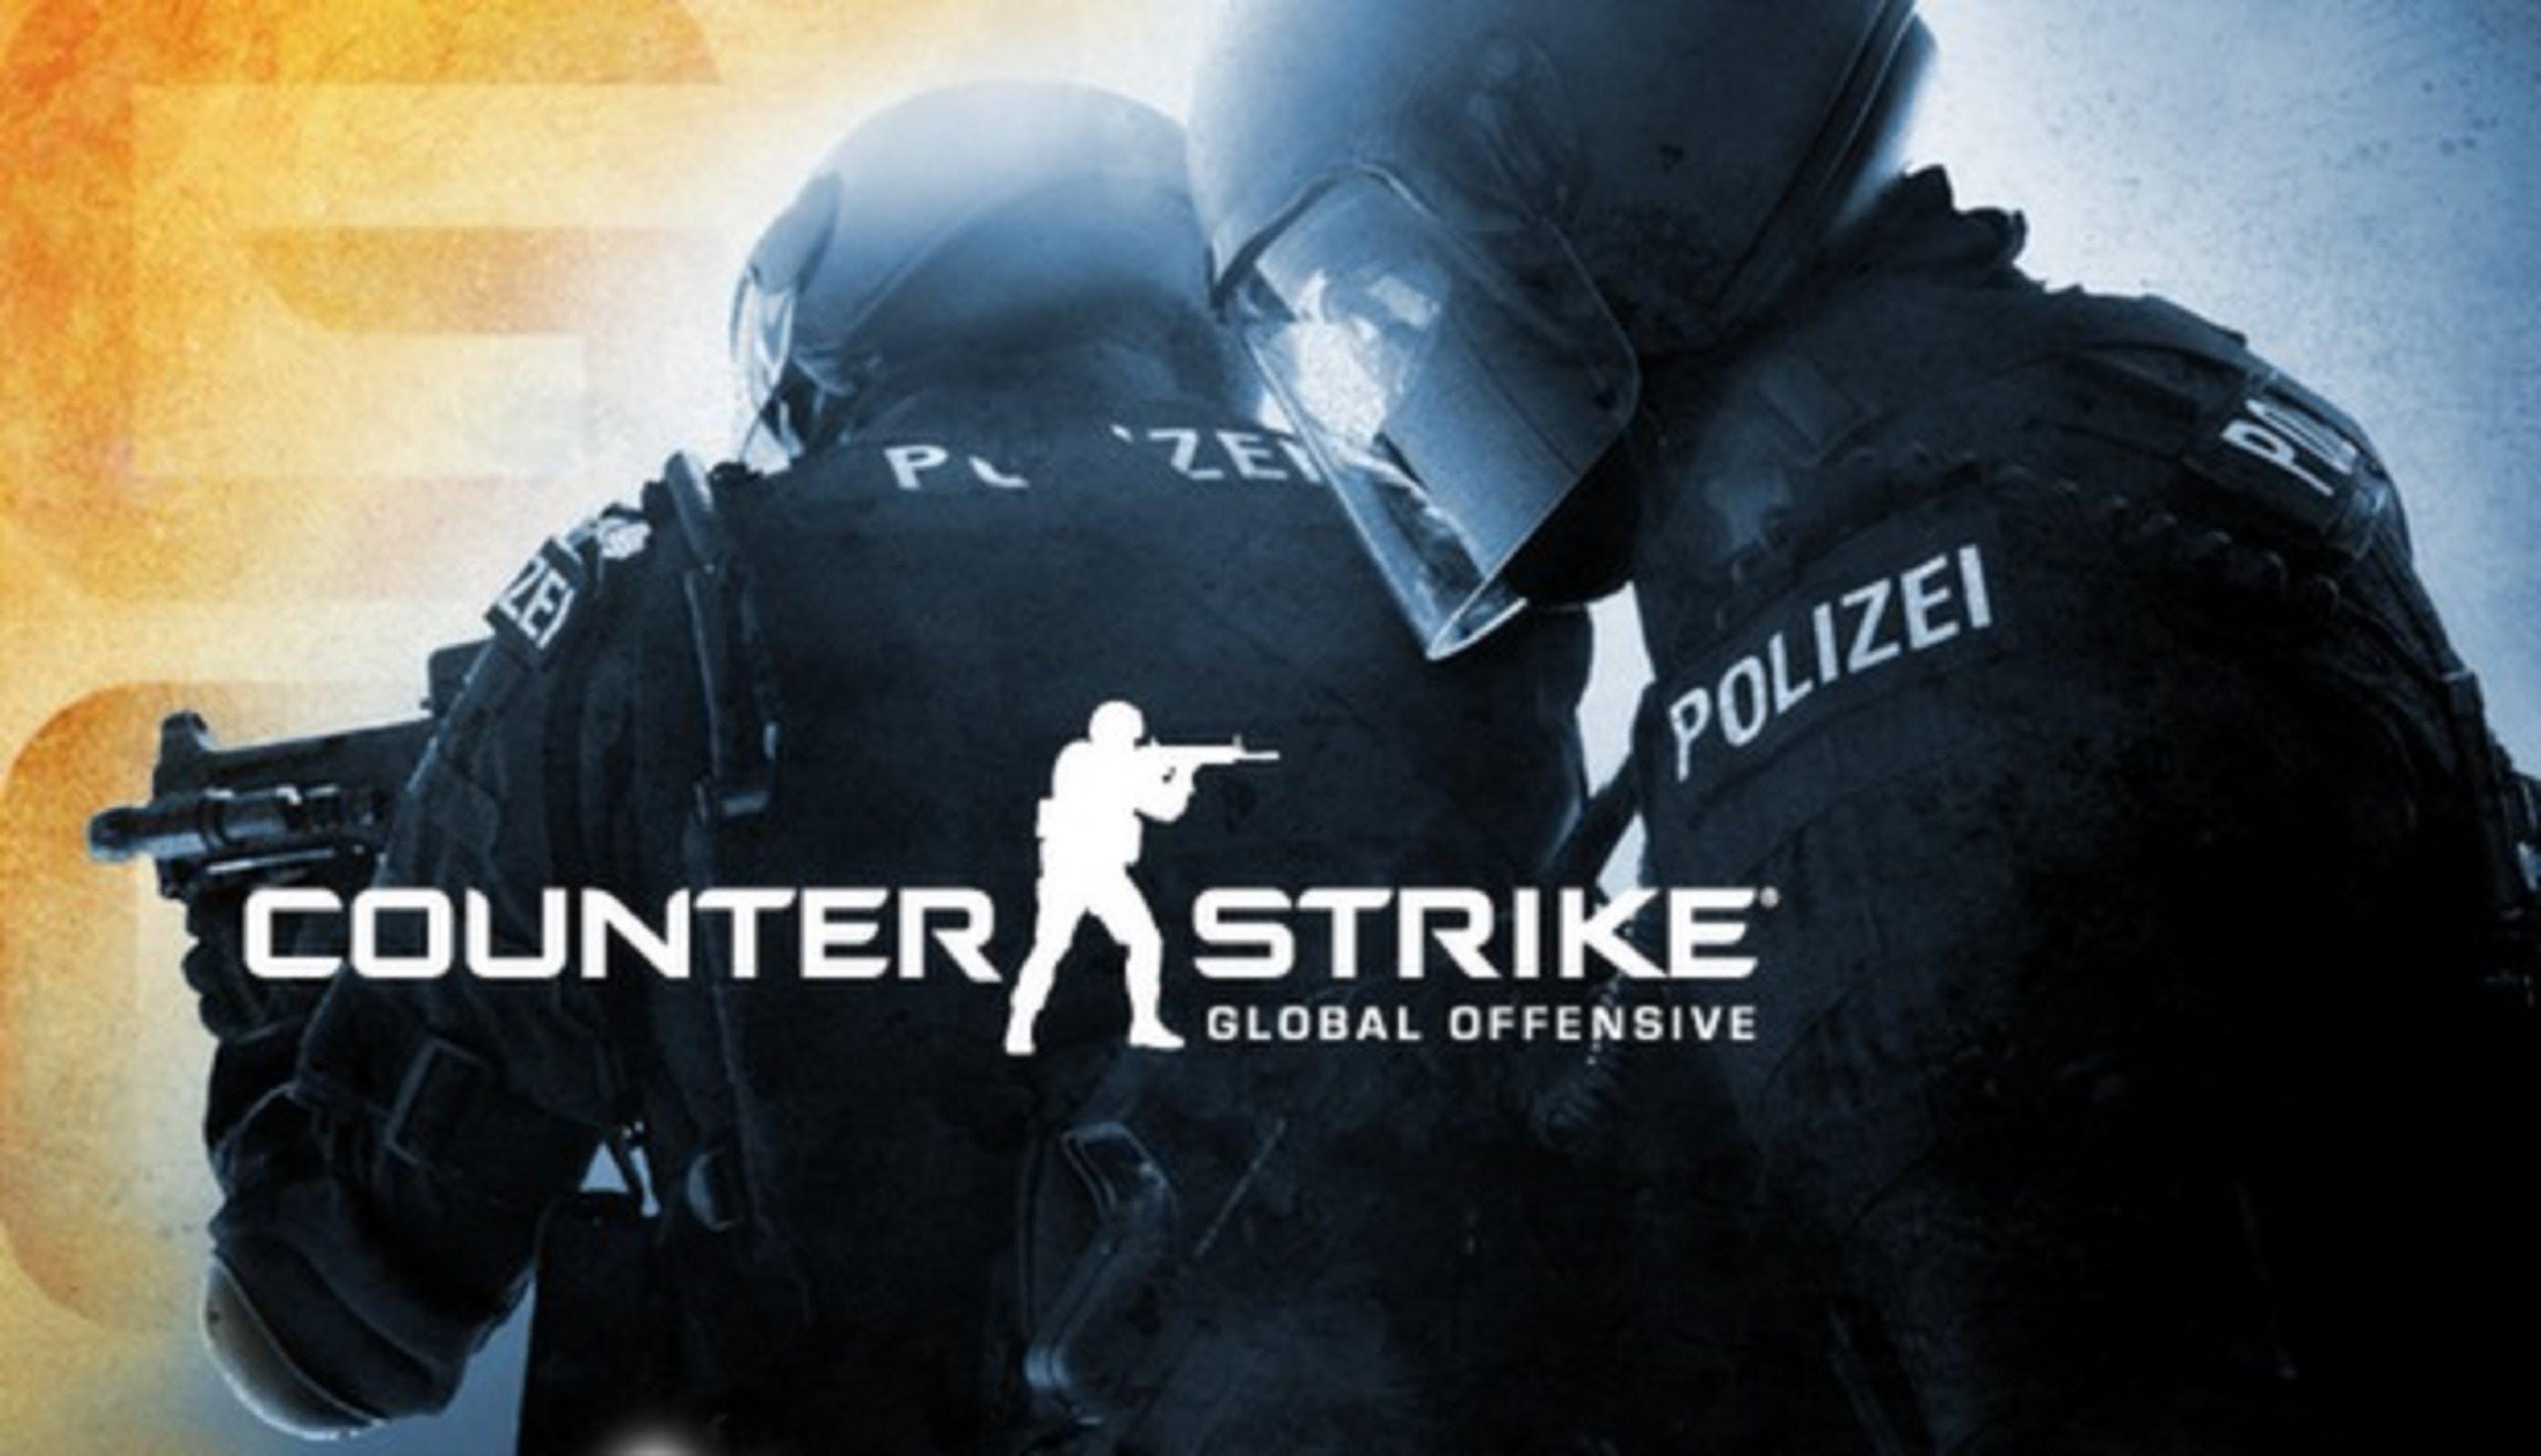 Counter-Strike: Global Offensive Desktop wallpapers